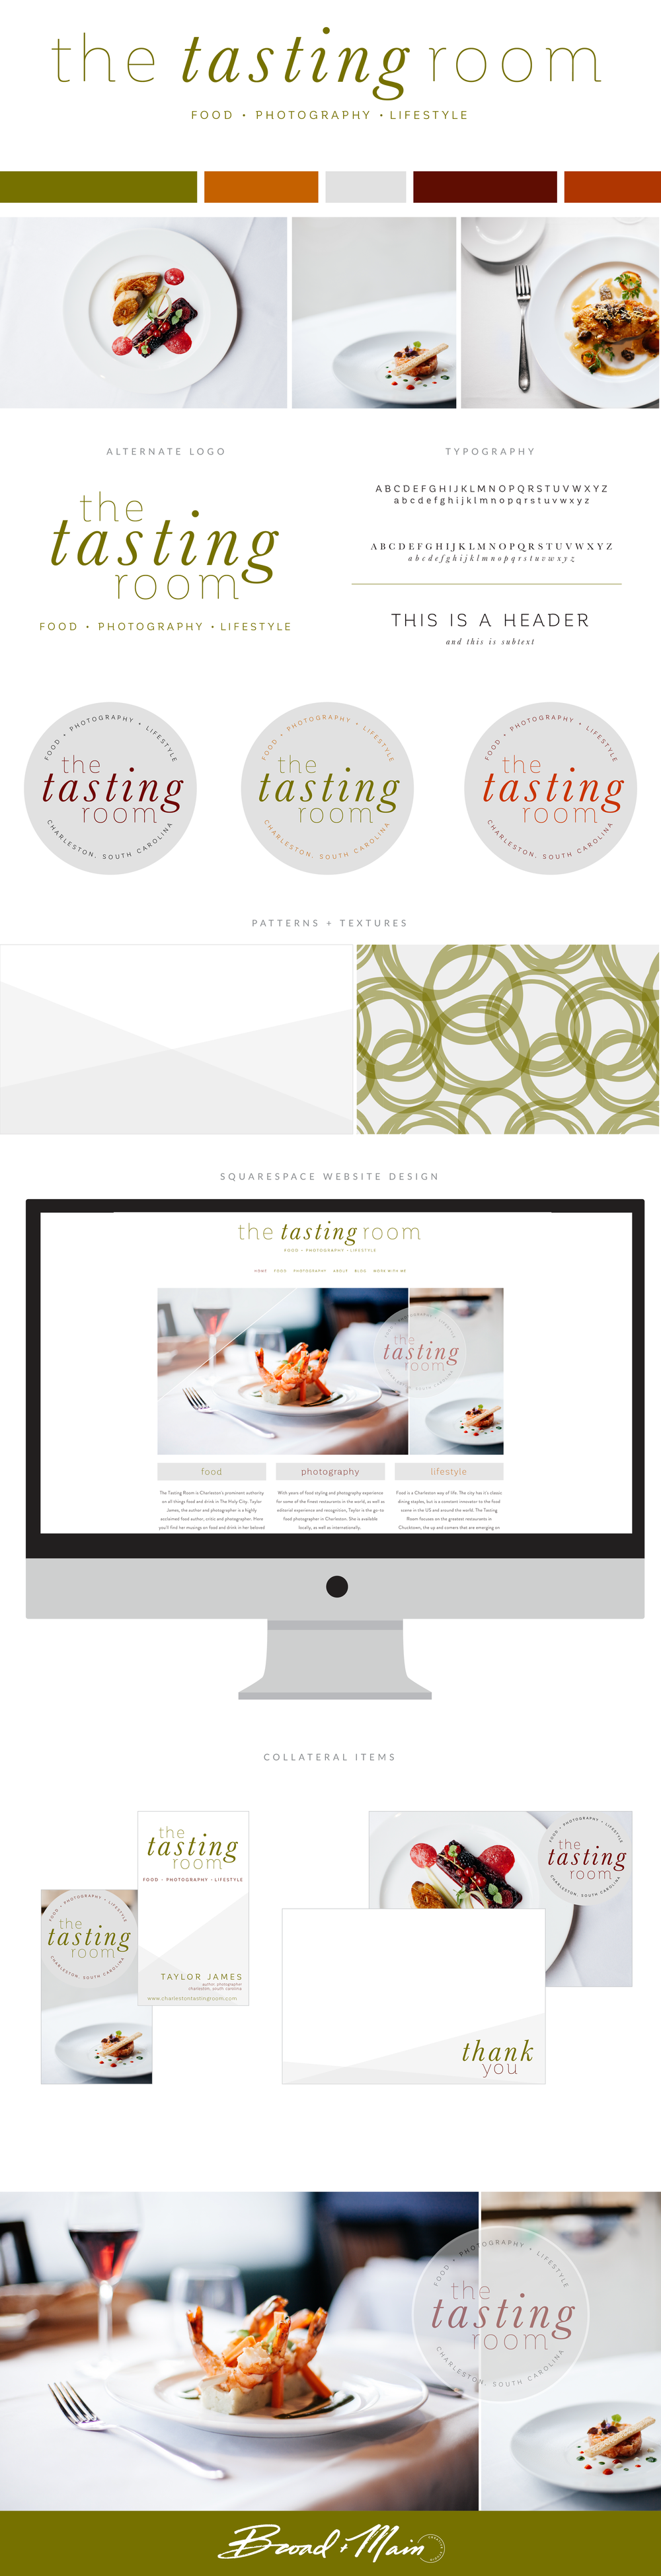 The Tasting Room | Broad + Main Design